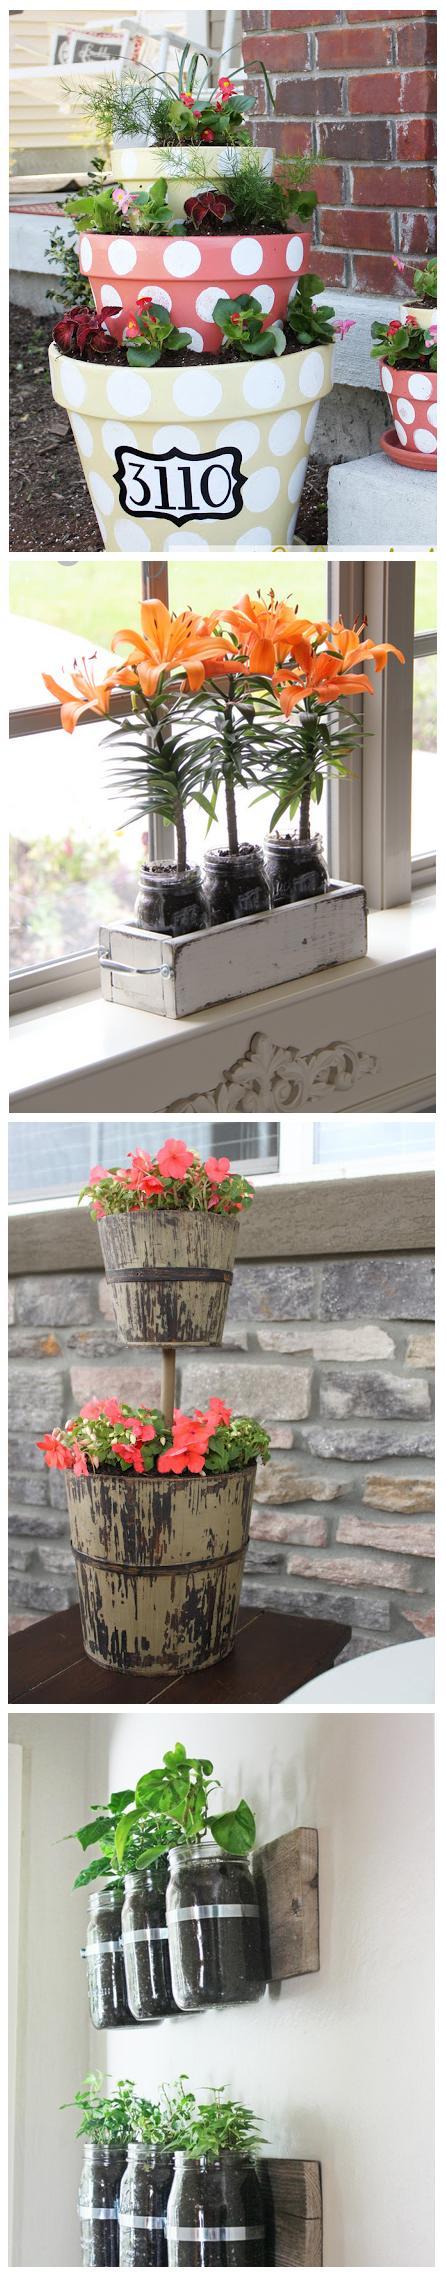 4 beautiful planter ideas for Beautiful planters